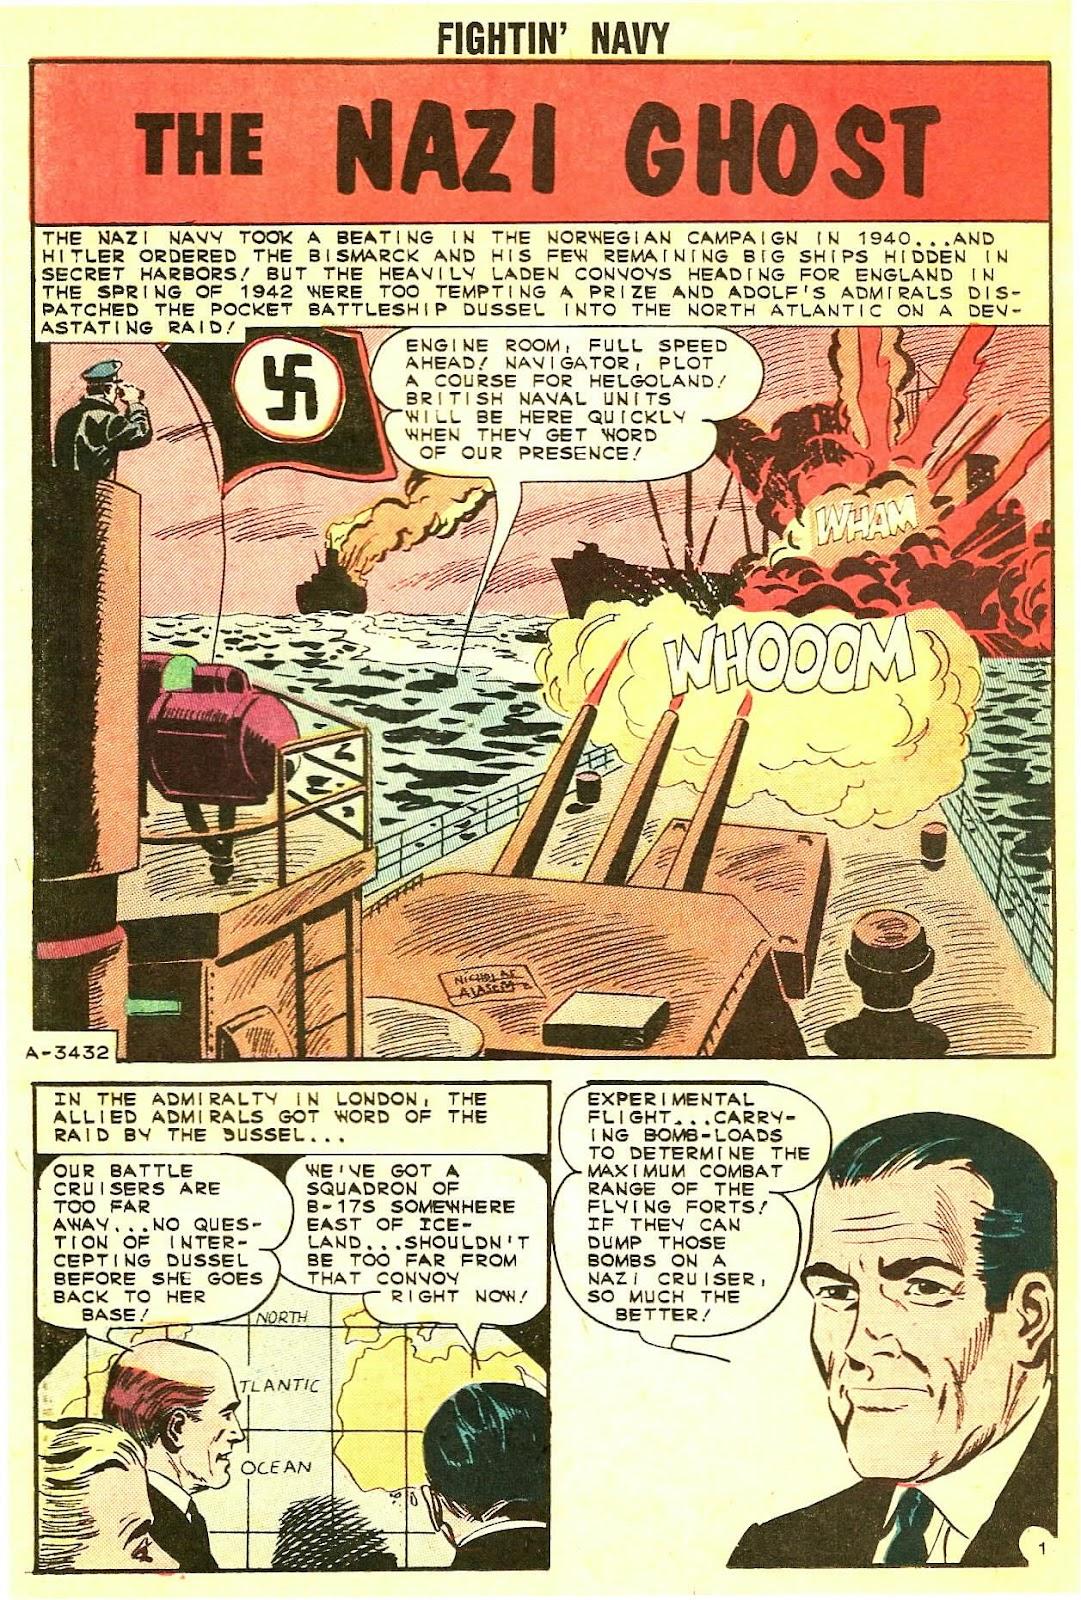 Read online Fightin' Navy comic -  Issue #115 - 20